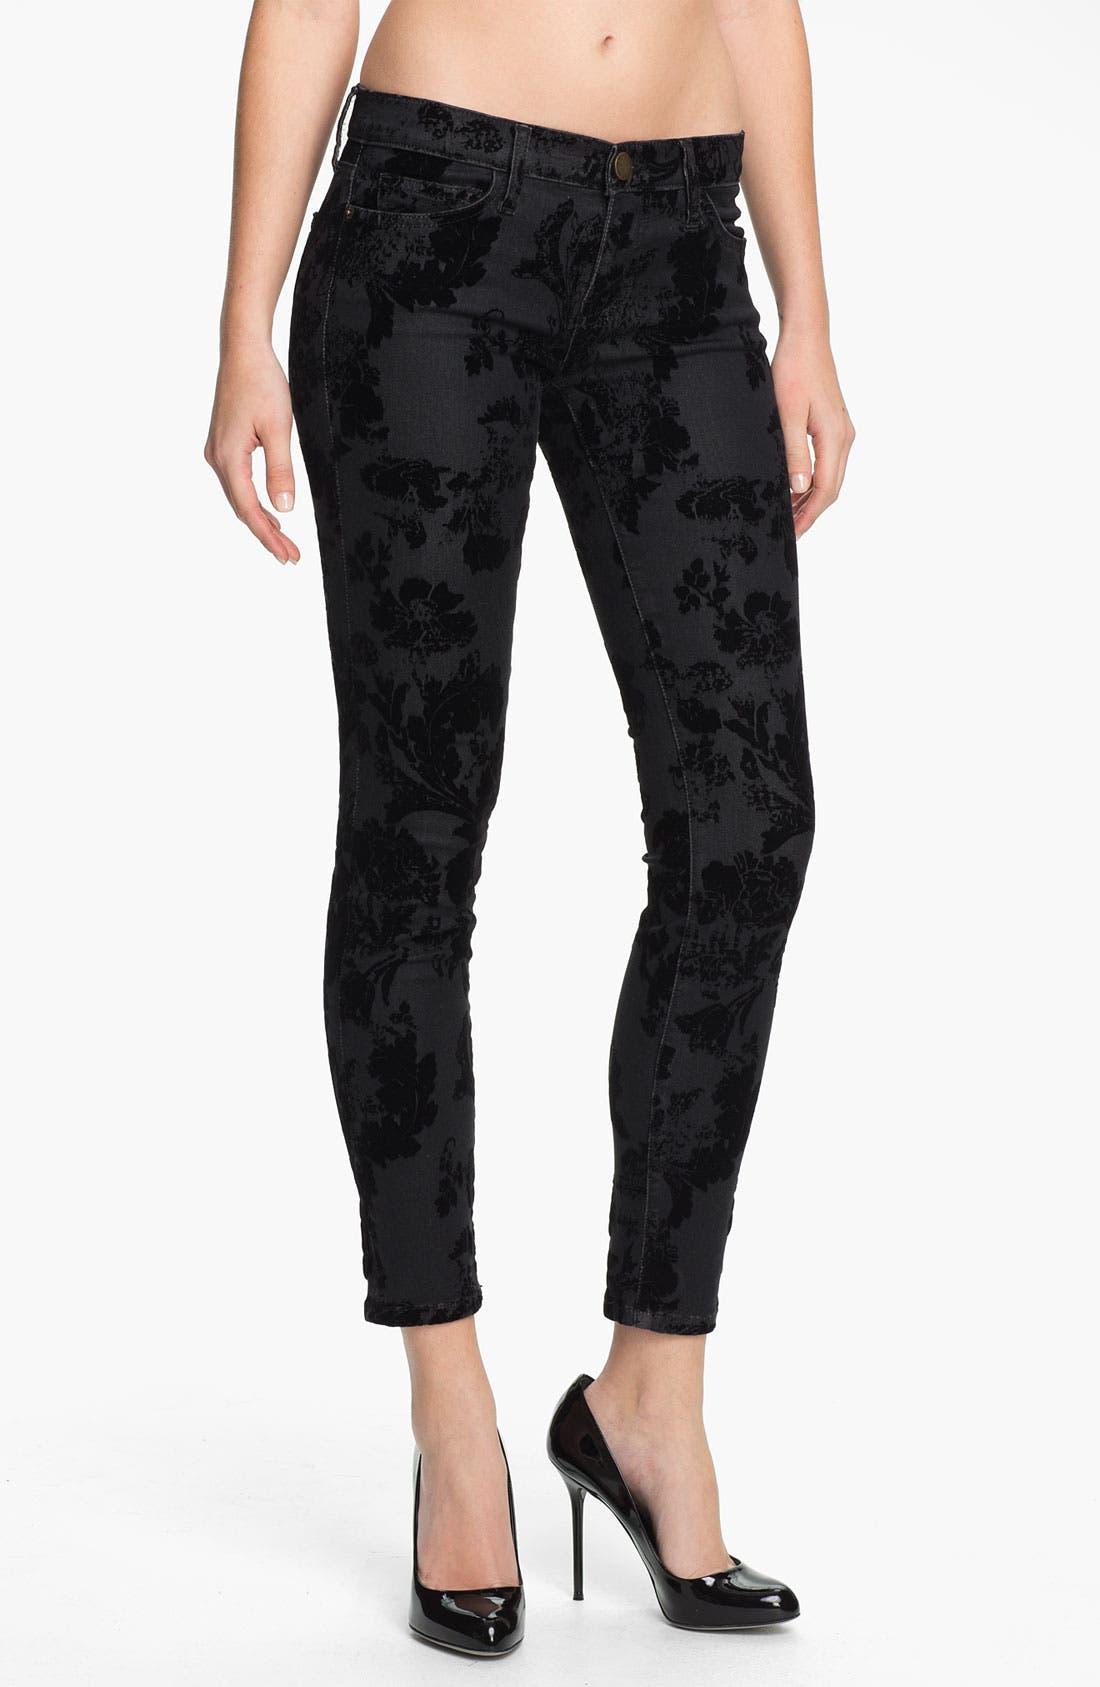 Alternate Image 1 Selected - Current/Elliott Ankle Zip Skinny Jeans (Black Velvet Floral)